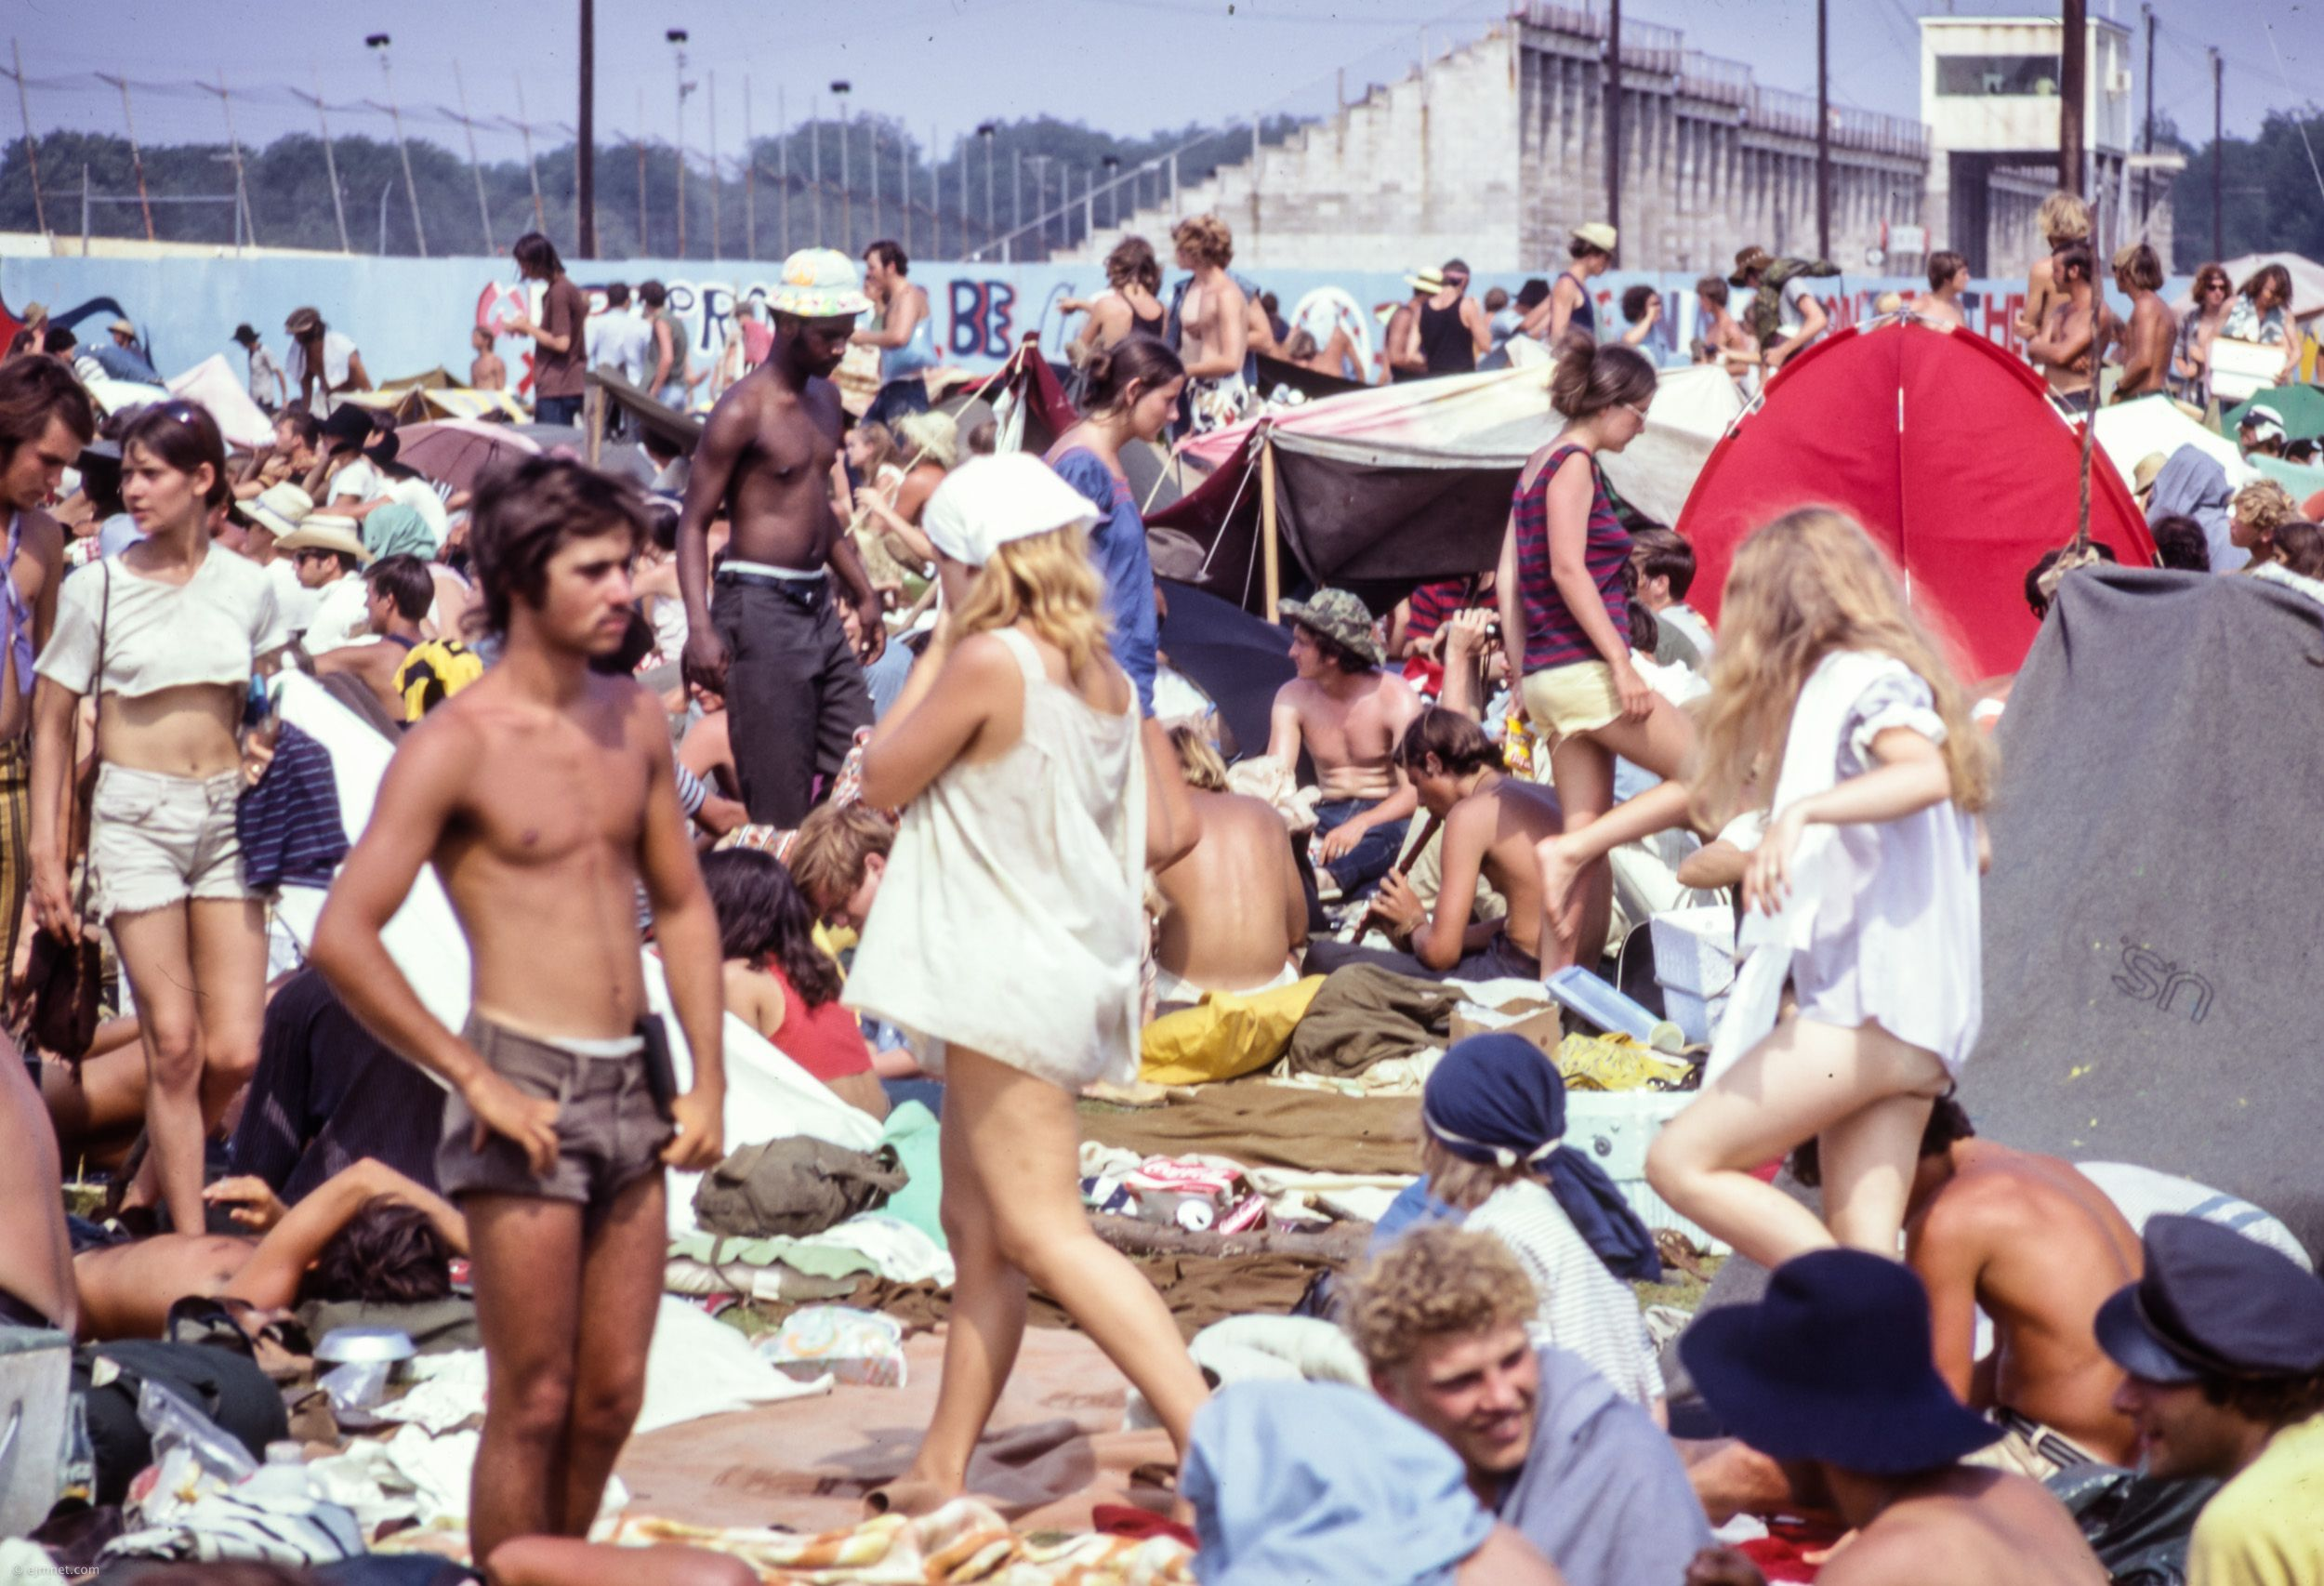 2ND ANNUAL ATLANTA POP FESTIVAL, 1970